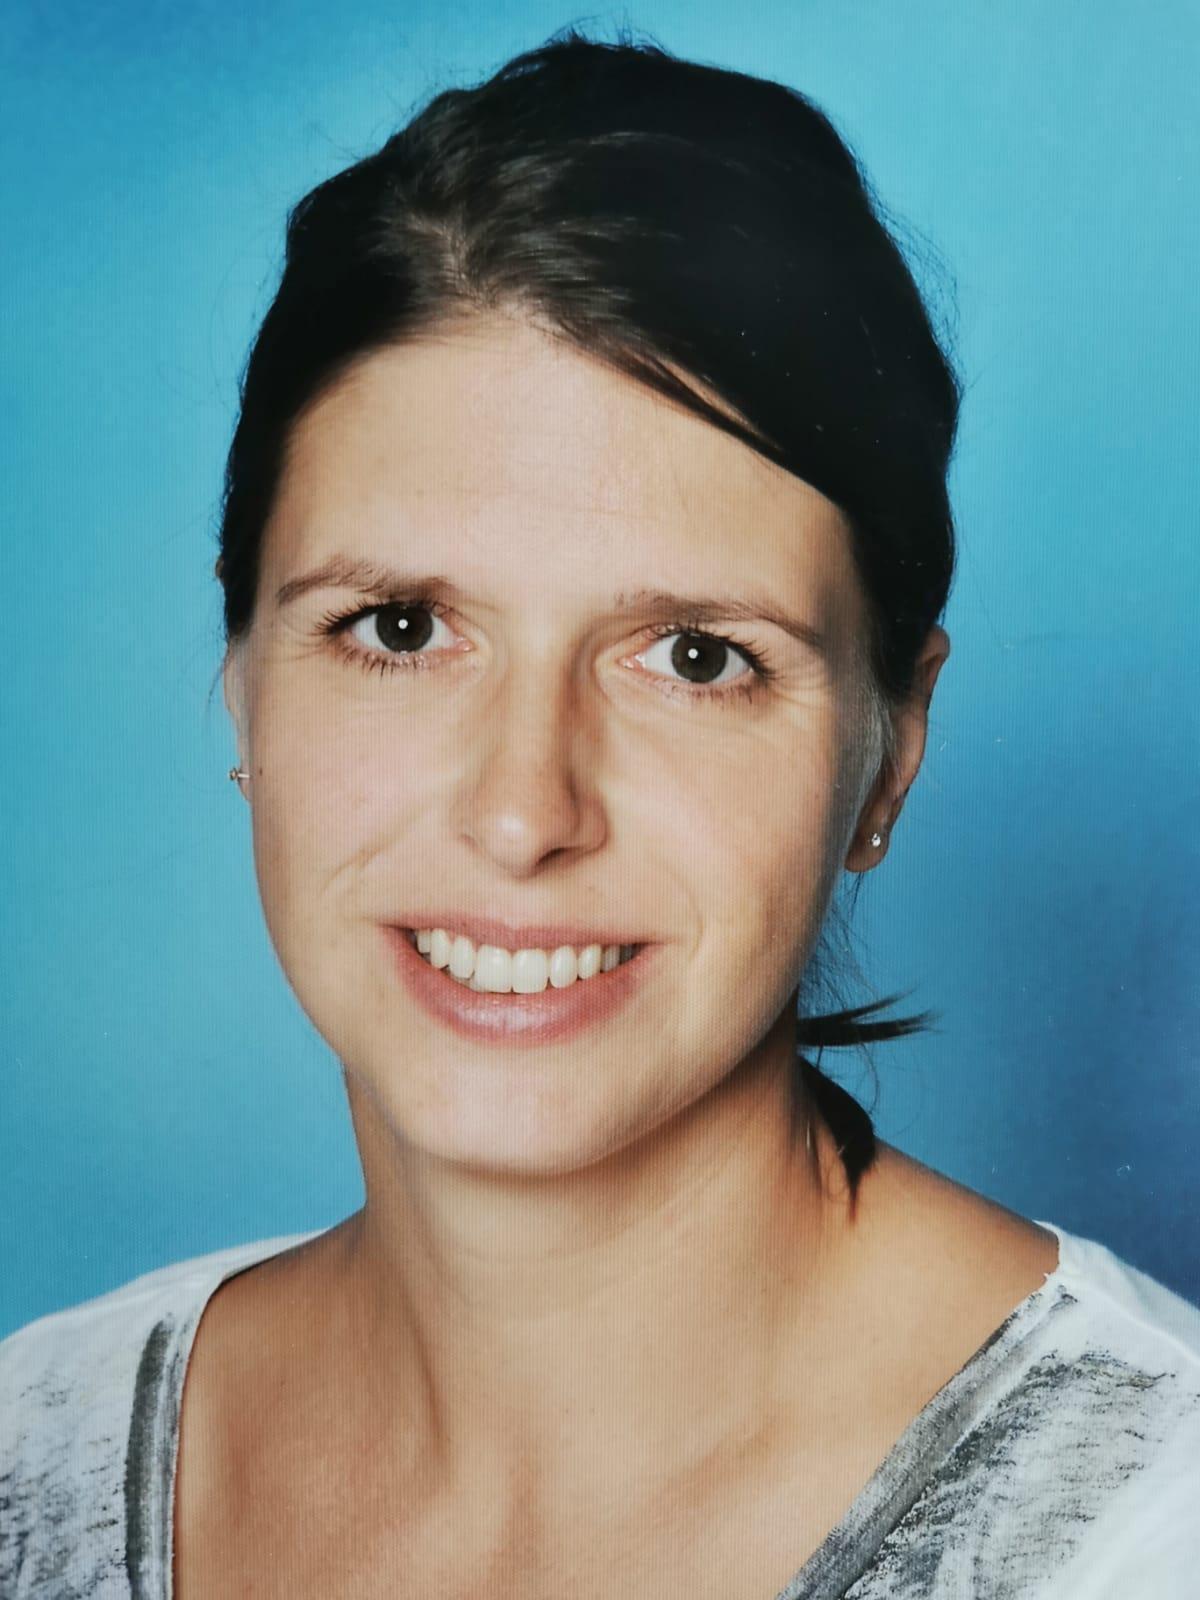 Janika Rittner